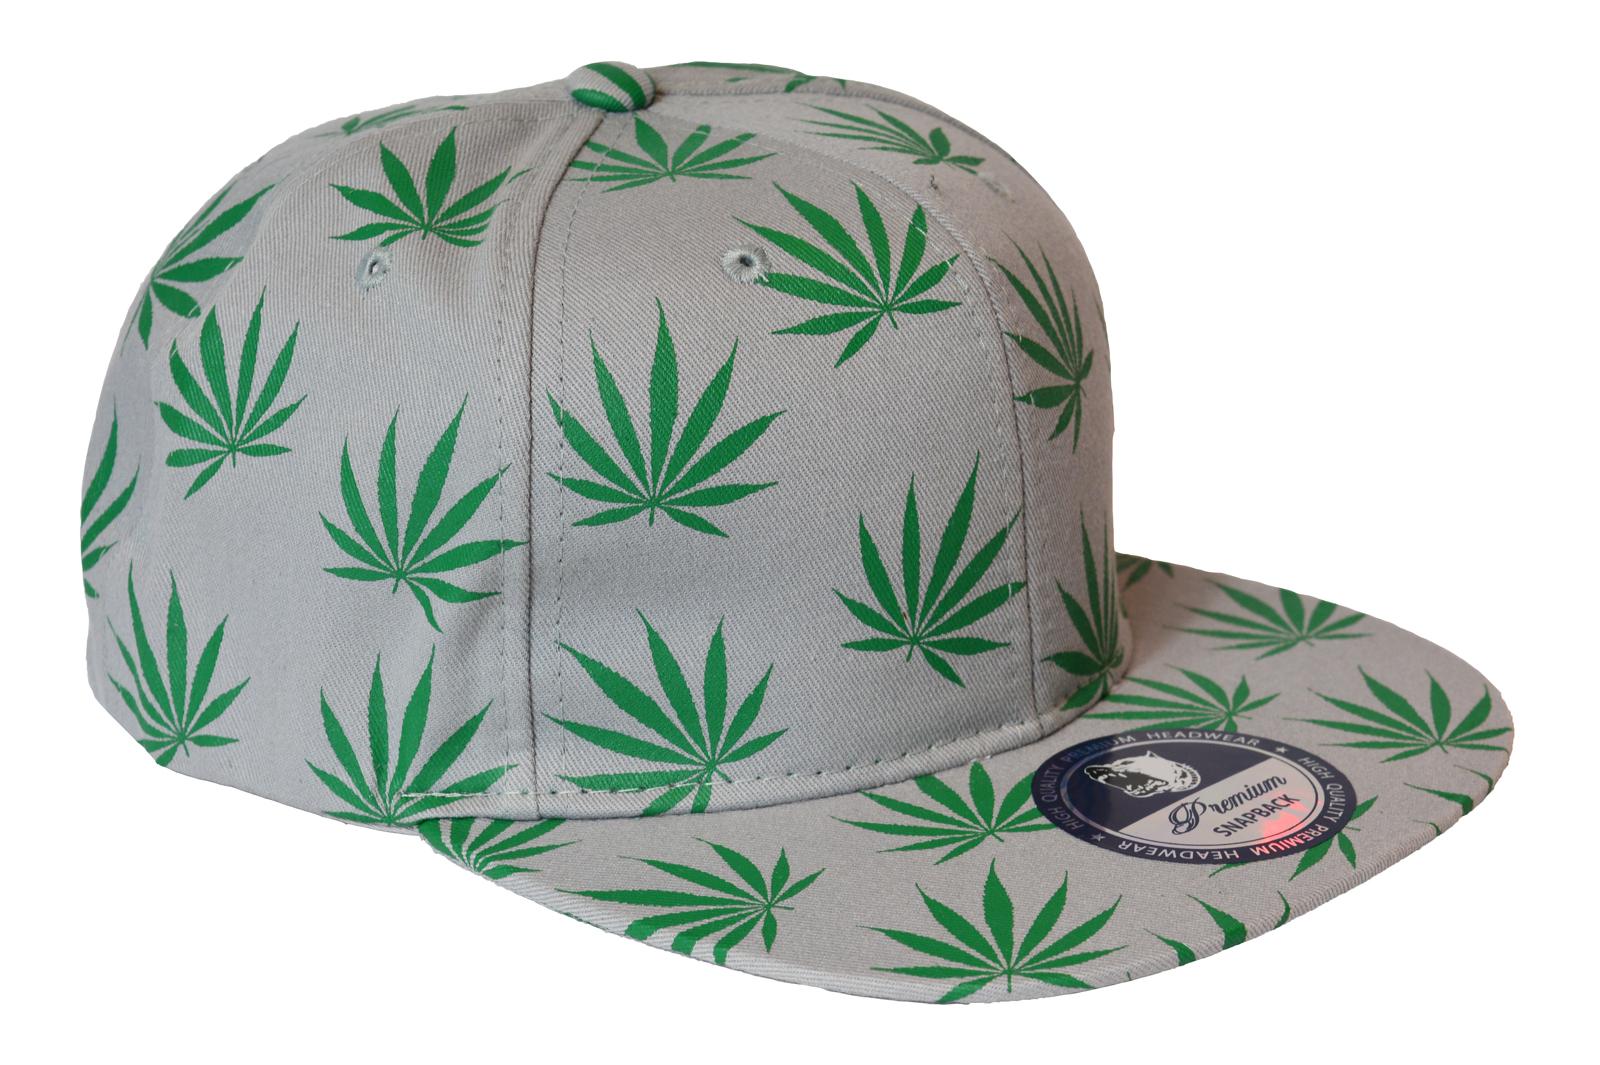 PREMIUM CAP SNAPBACK HAT KAPPE HANF MARIJUANA POT HIP HOP  Premium WEED SERIES